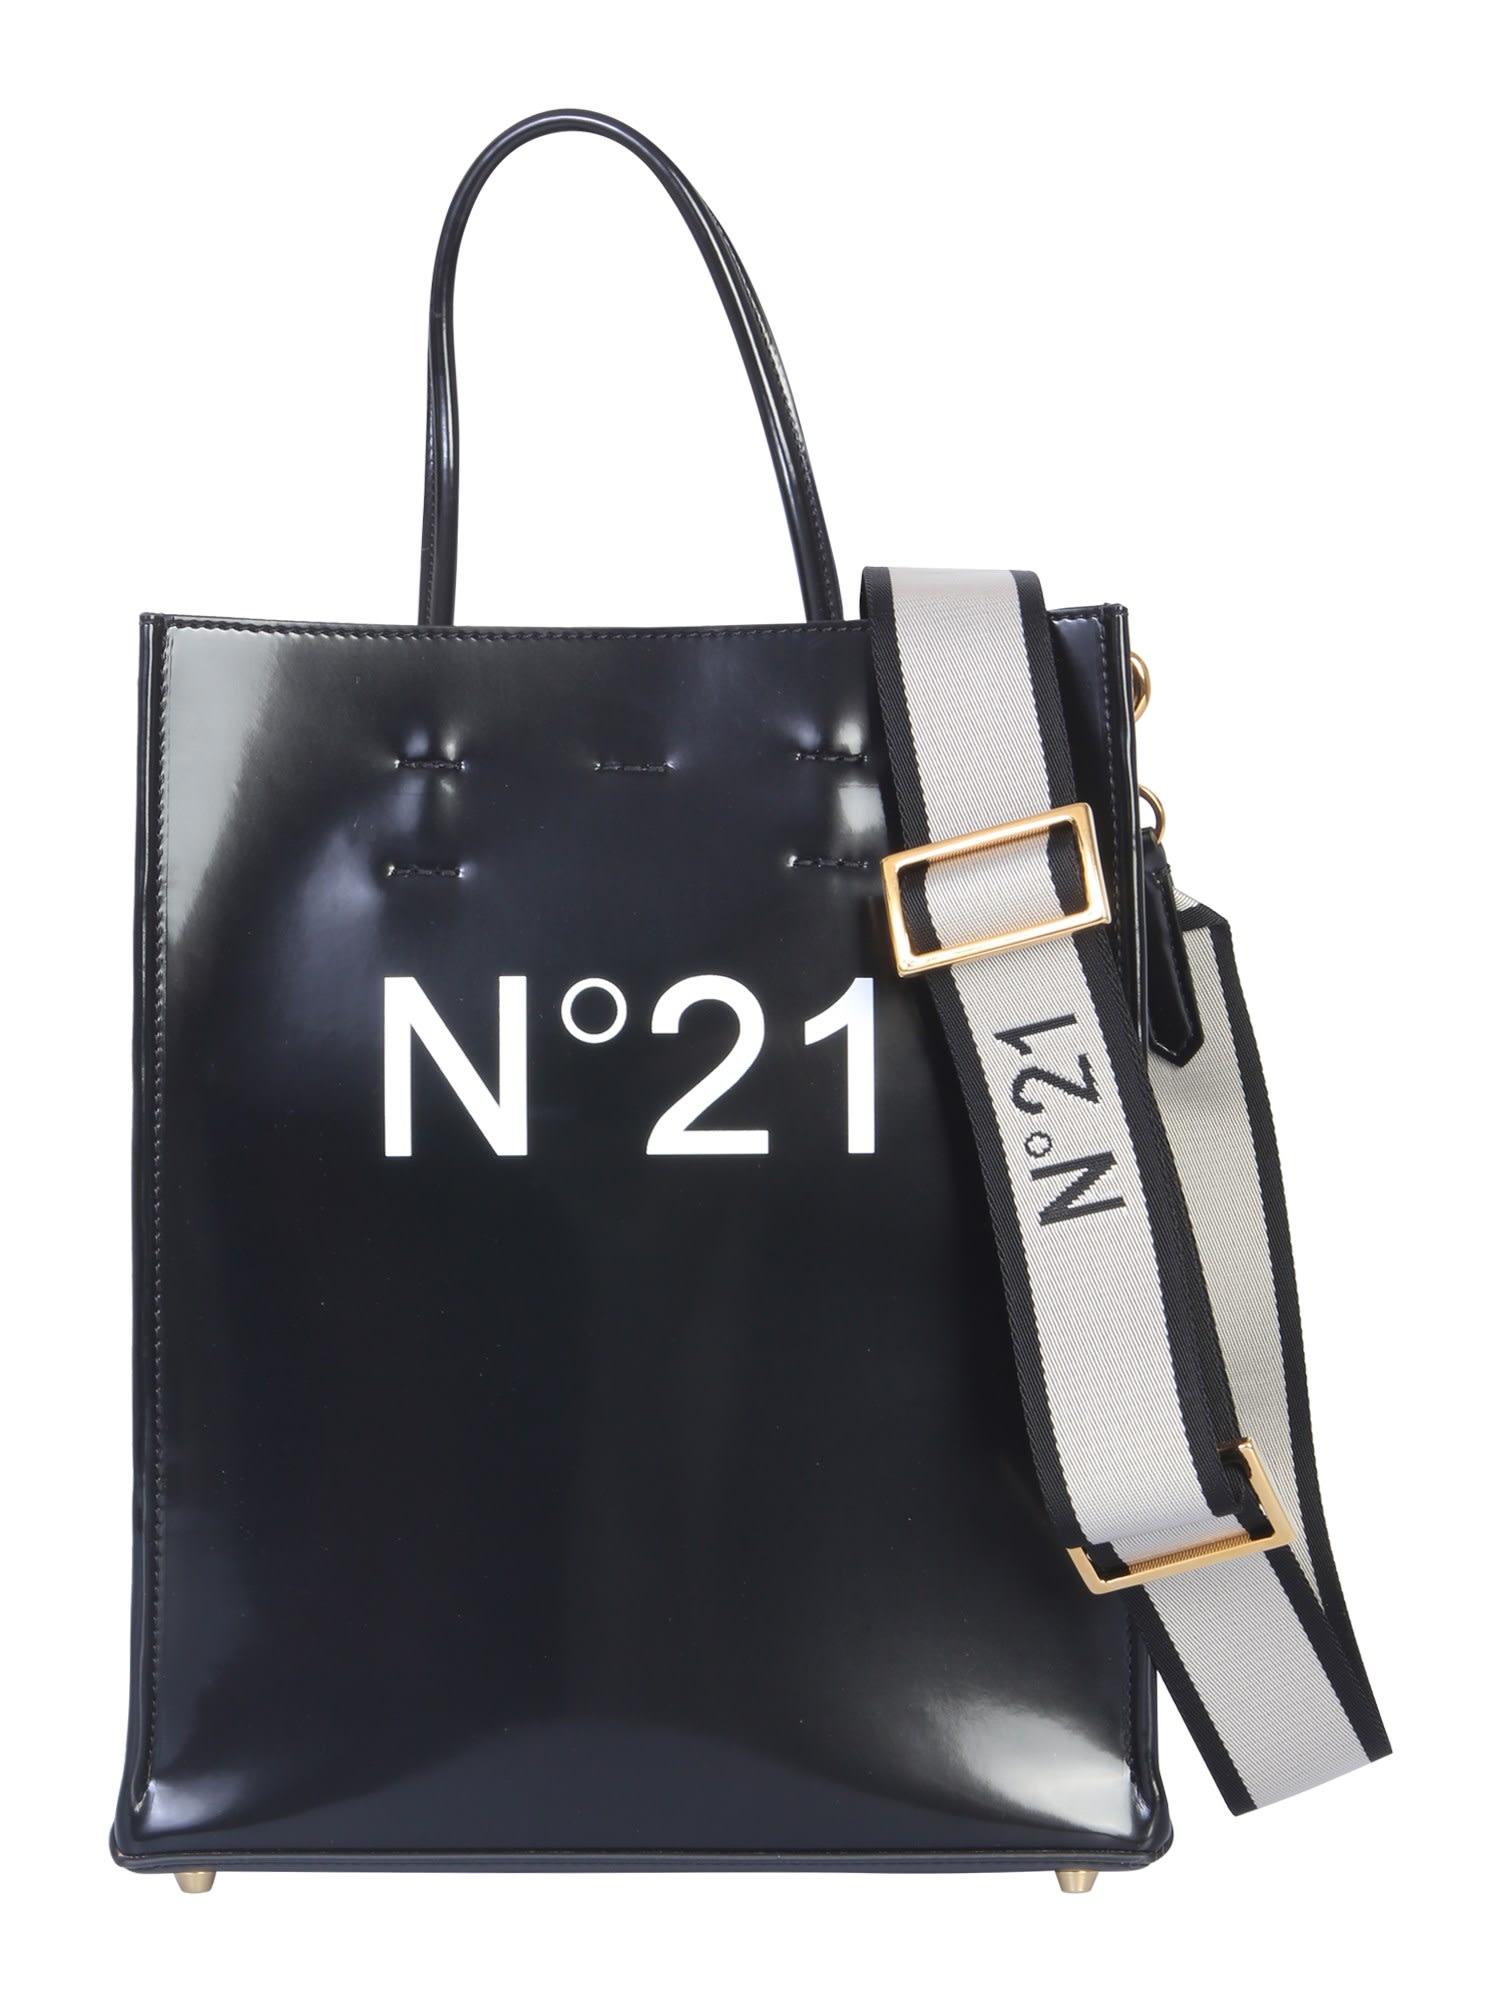 N°21 SMALL SHOPPING BAG